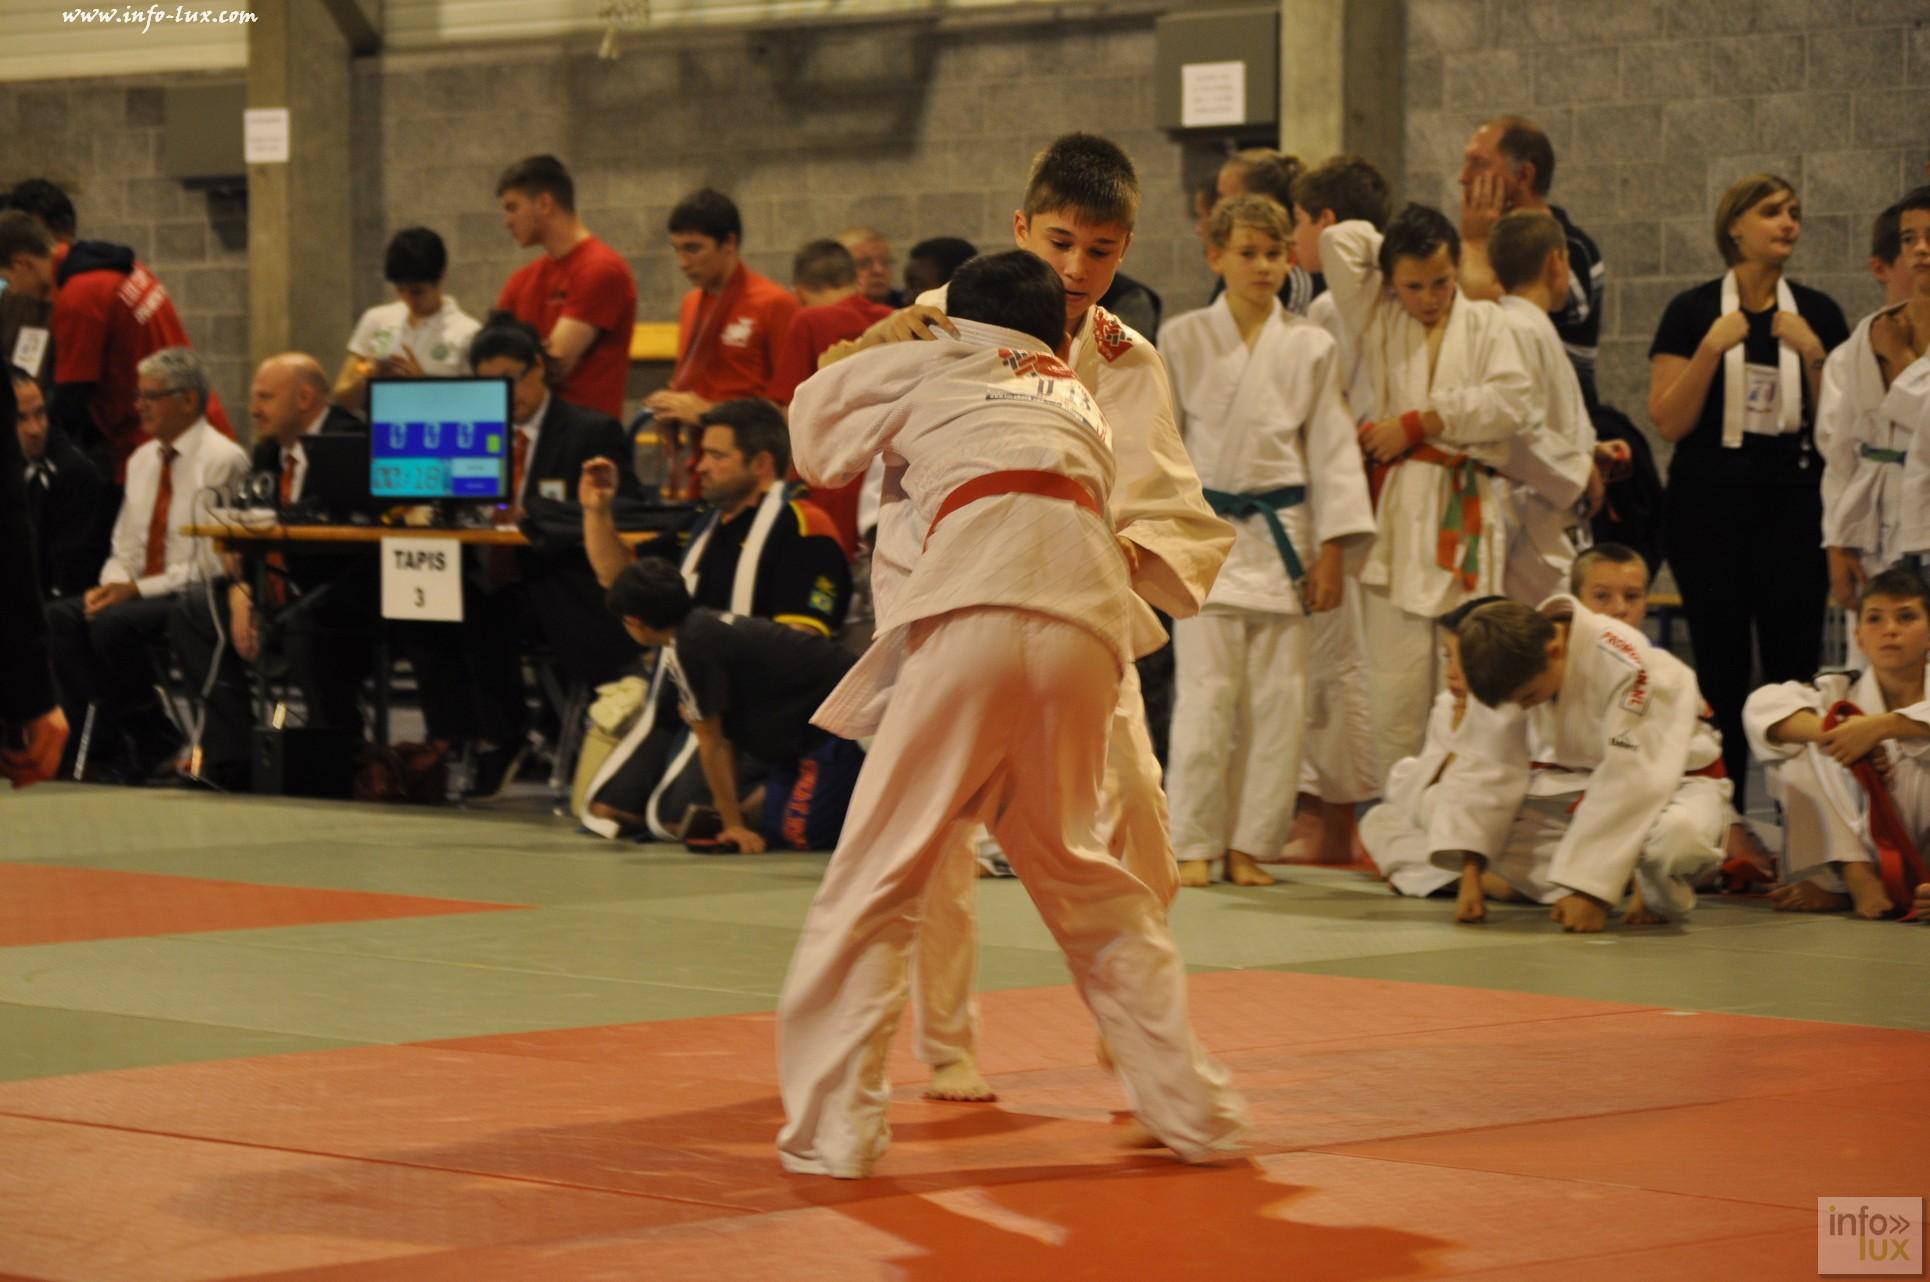 images/stories/PHOTOSREP/Bastogne/judo/Judo-Basto63